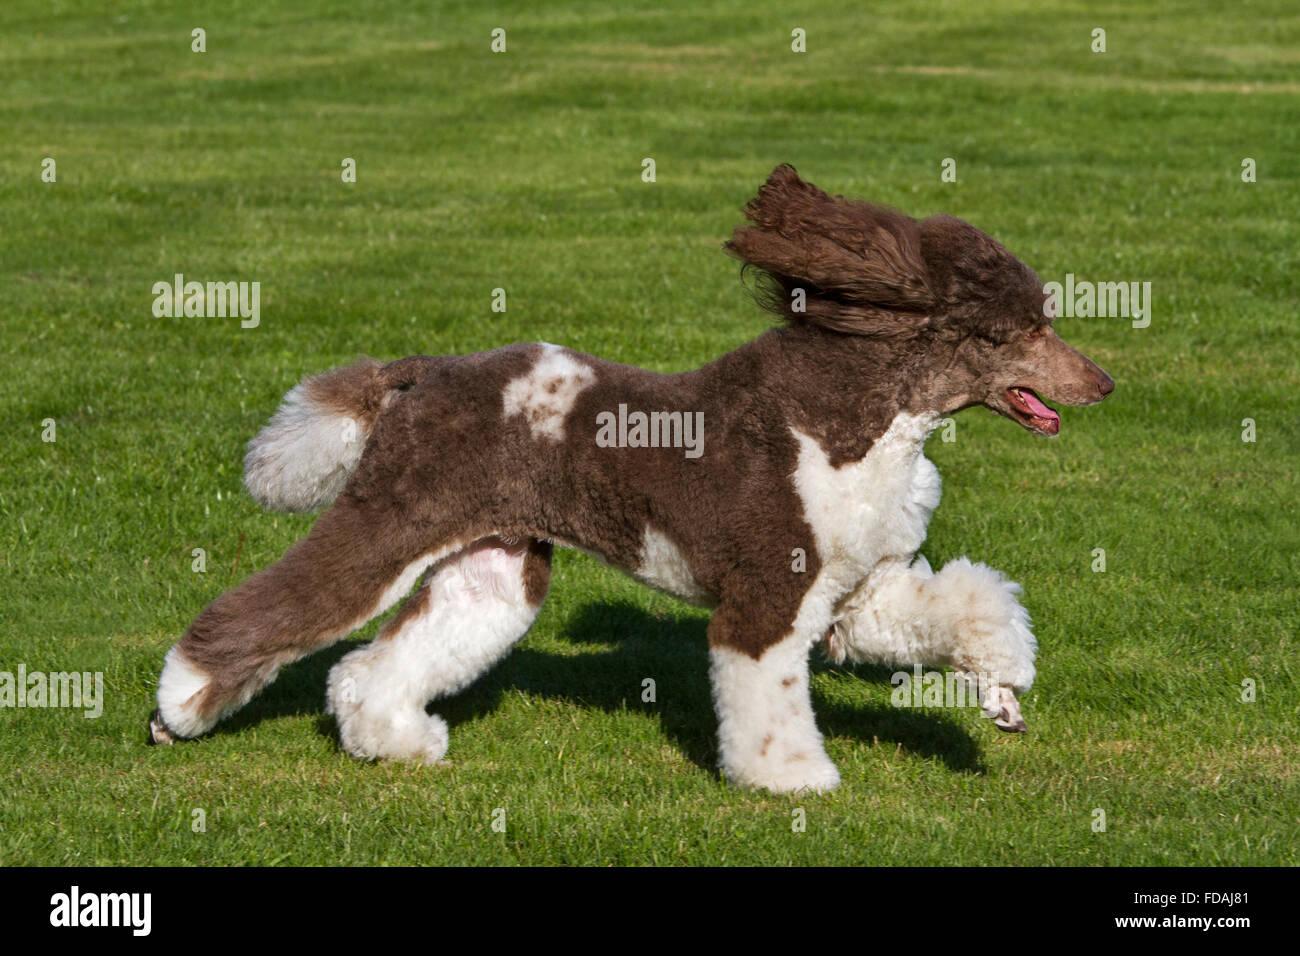 Harlequin poodle (Canis lupus familiaris) running in garden - Stock Image